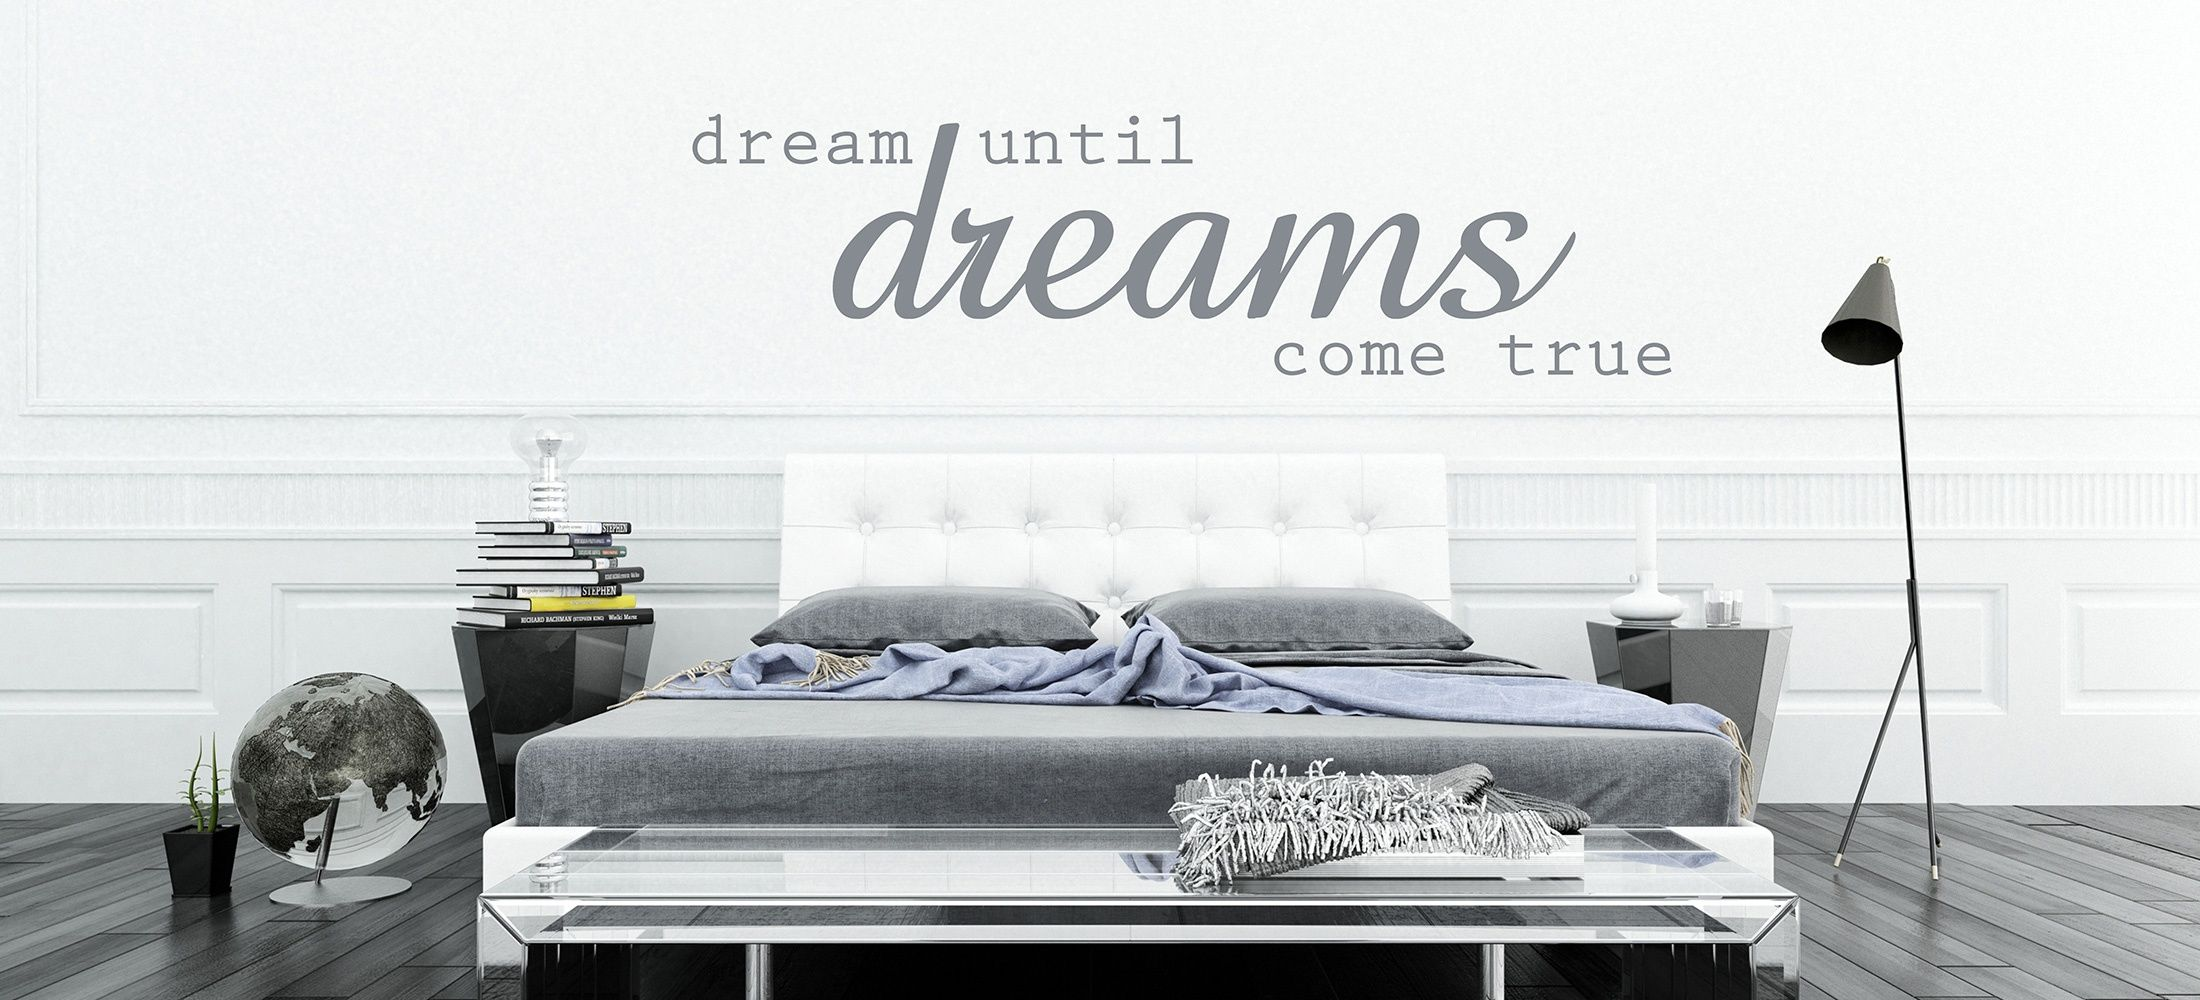 Muursticker slaapkamer - Cameo | Pinterest - Slaapkamer ...